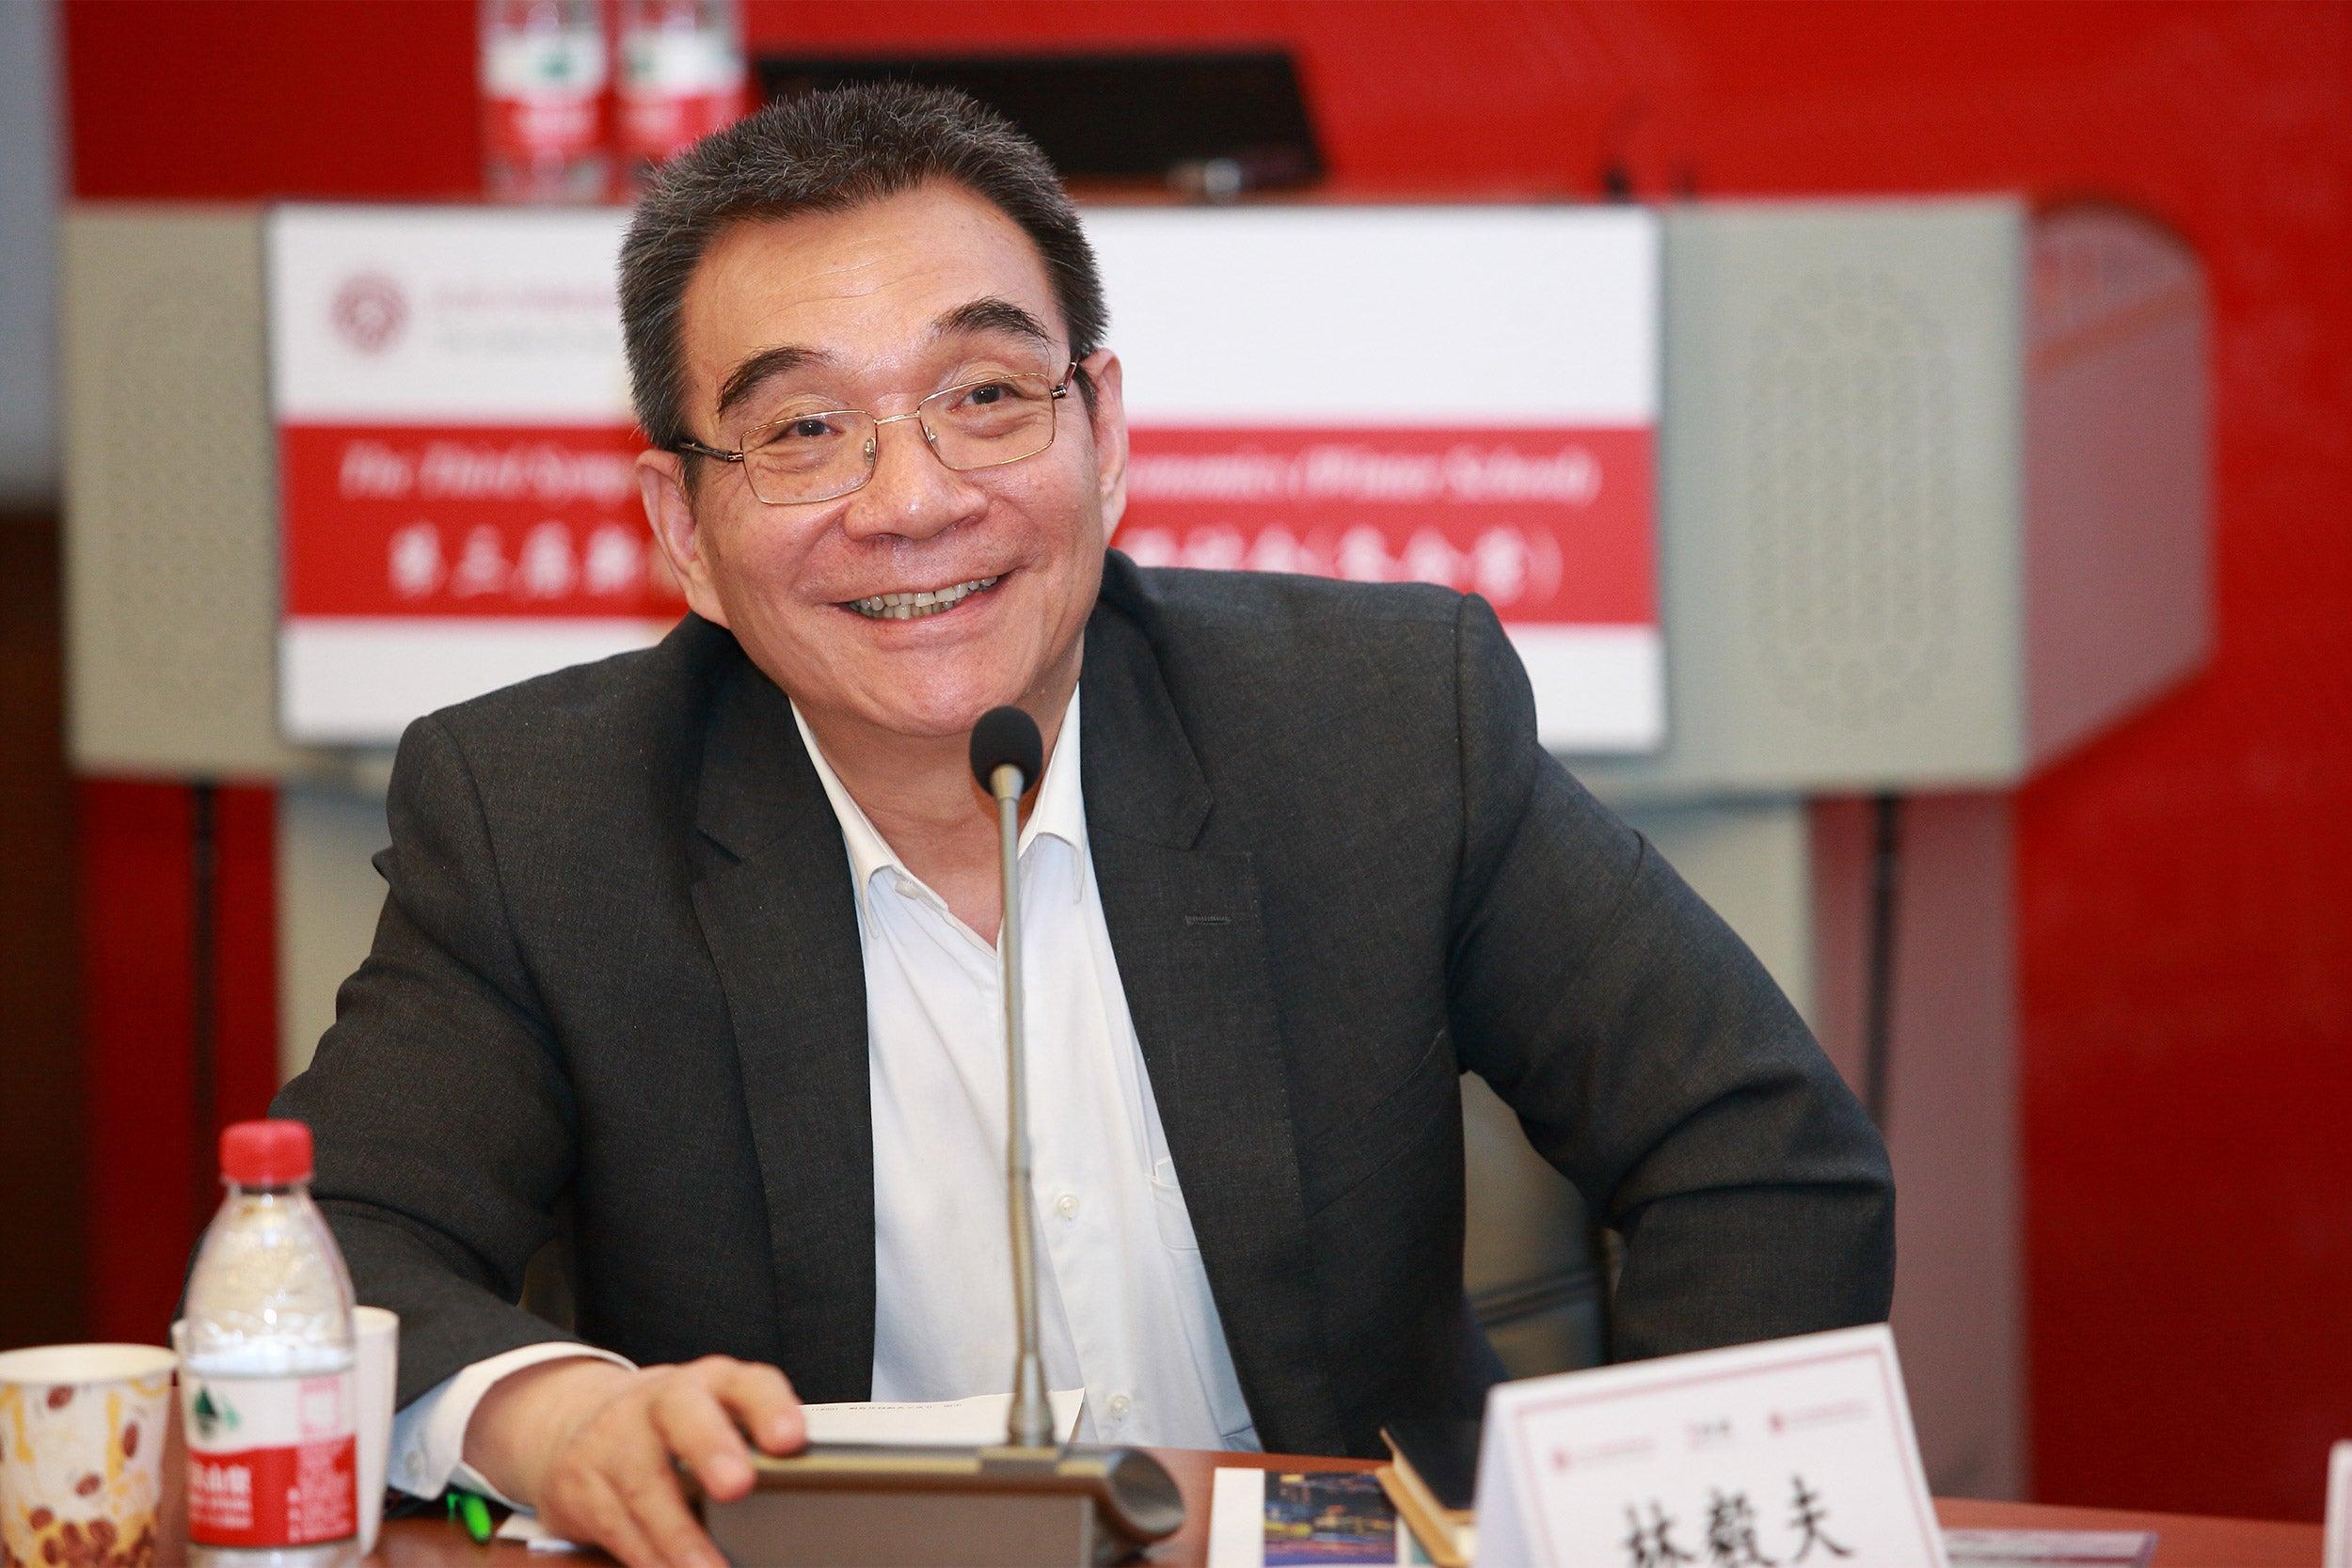 Chinese economist speaks at Harvard